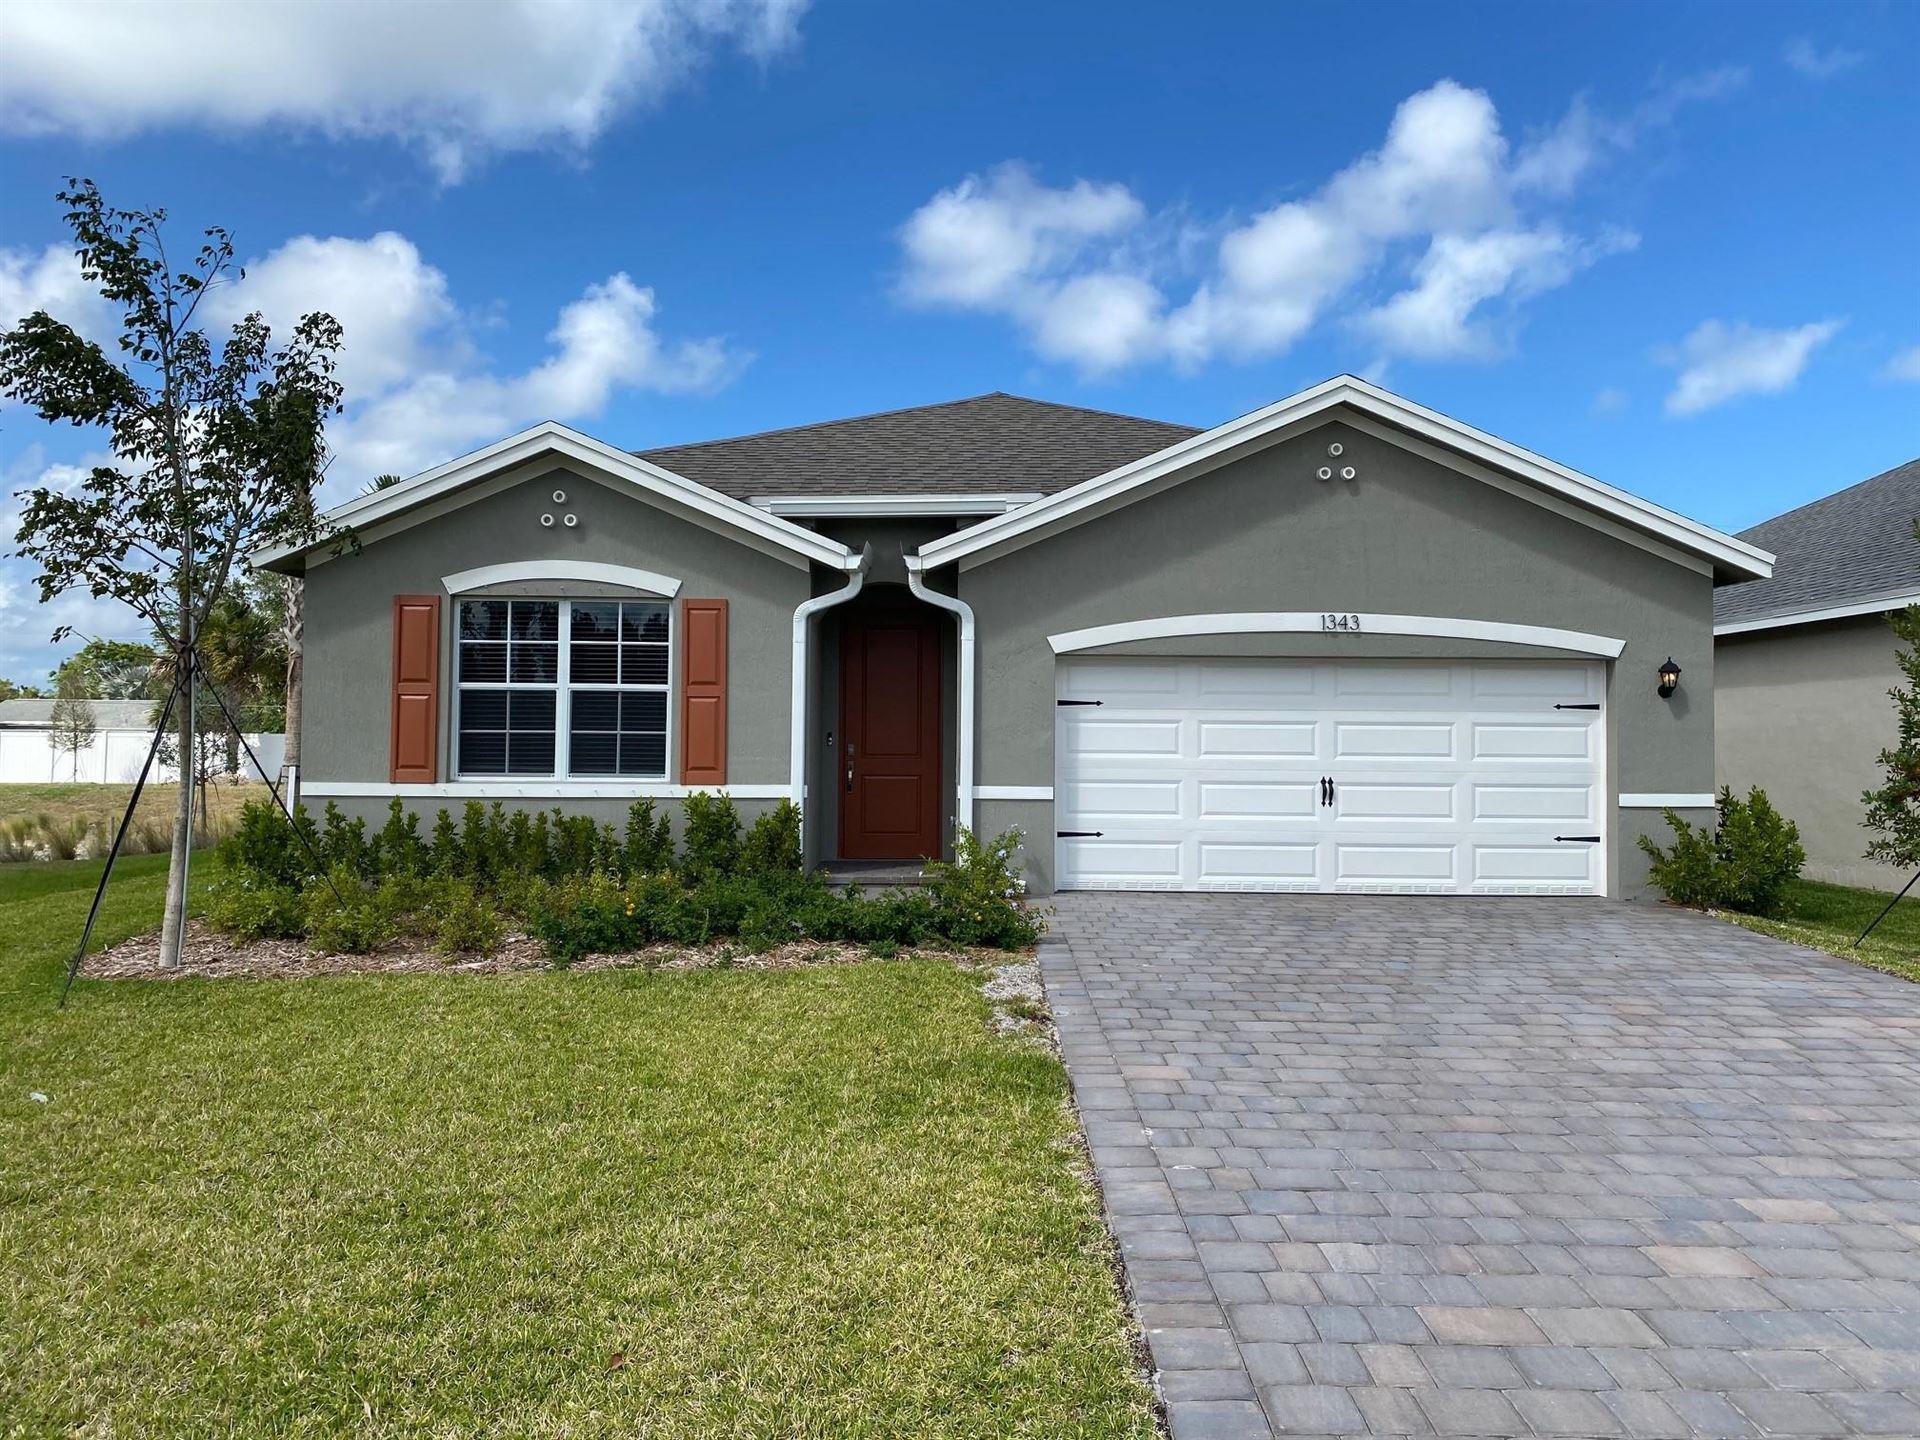 1343 NE White Pine Terrace, Jensen Beach, FL 34957 - #: RX-10613820